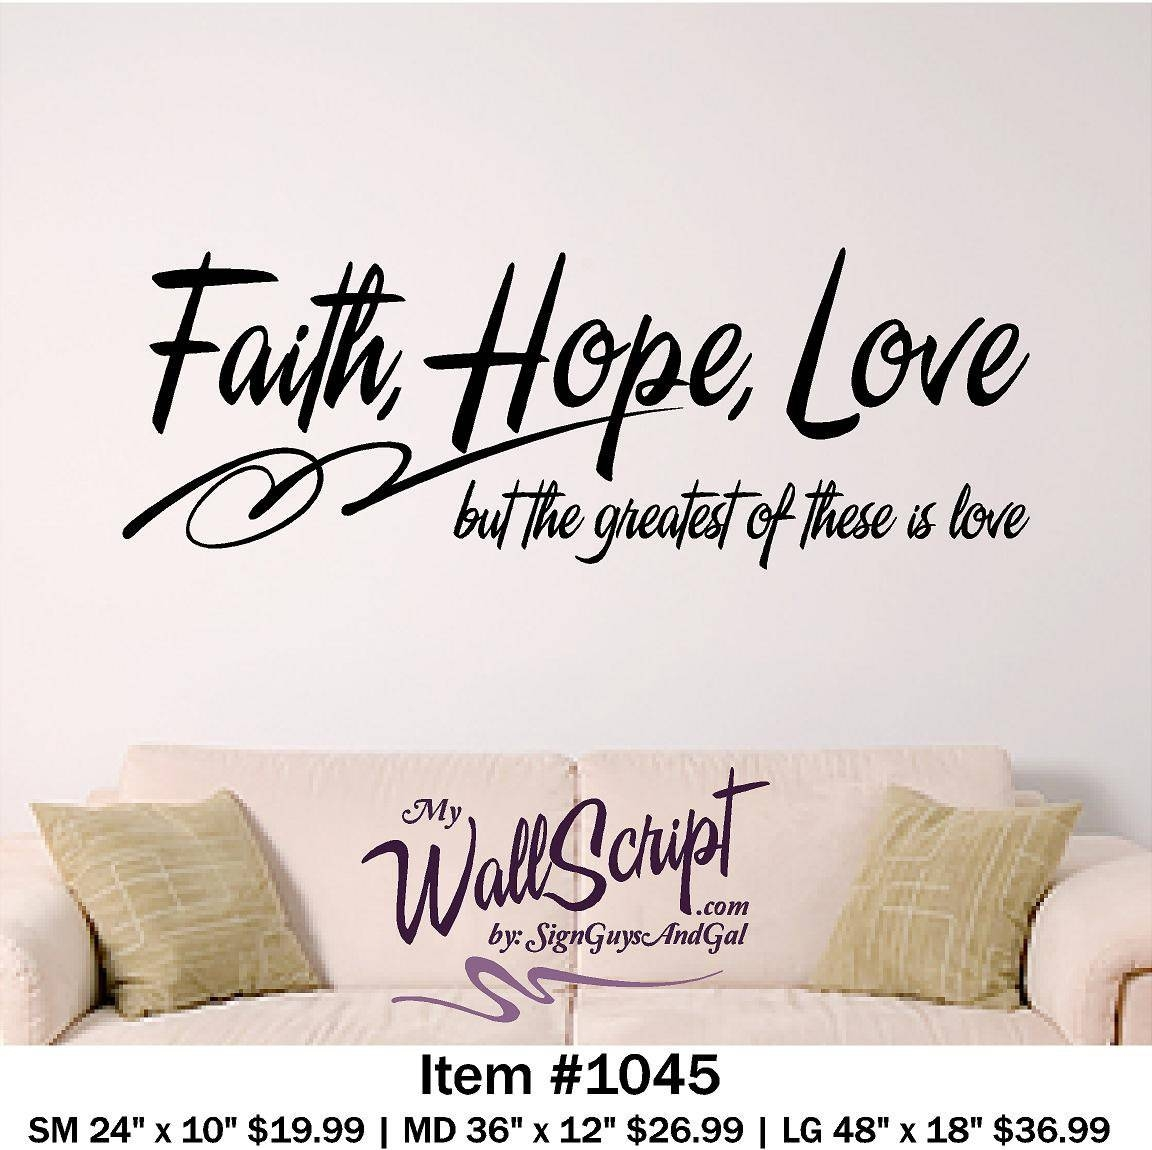 Bible Verse Wall Art Faith Hope Love Wall Decal Regarding Best And Newest Bible Verses Wall Art (View 2 of 30)